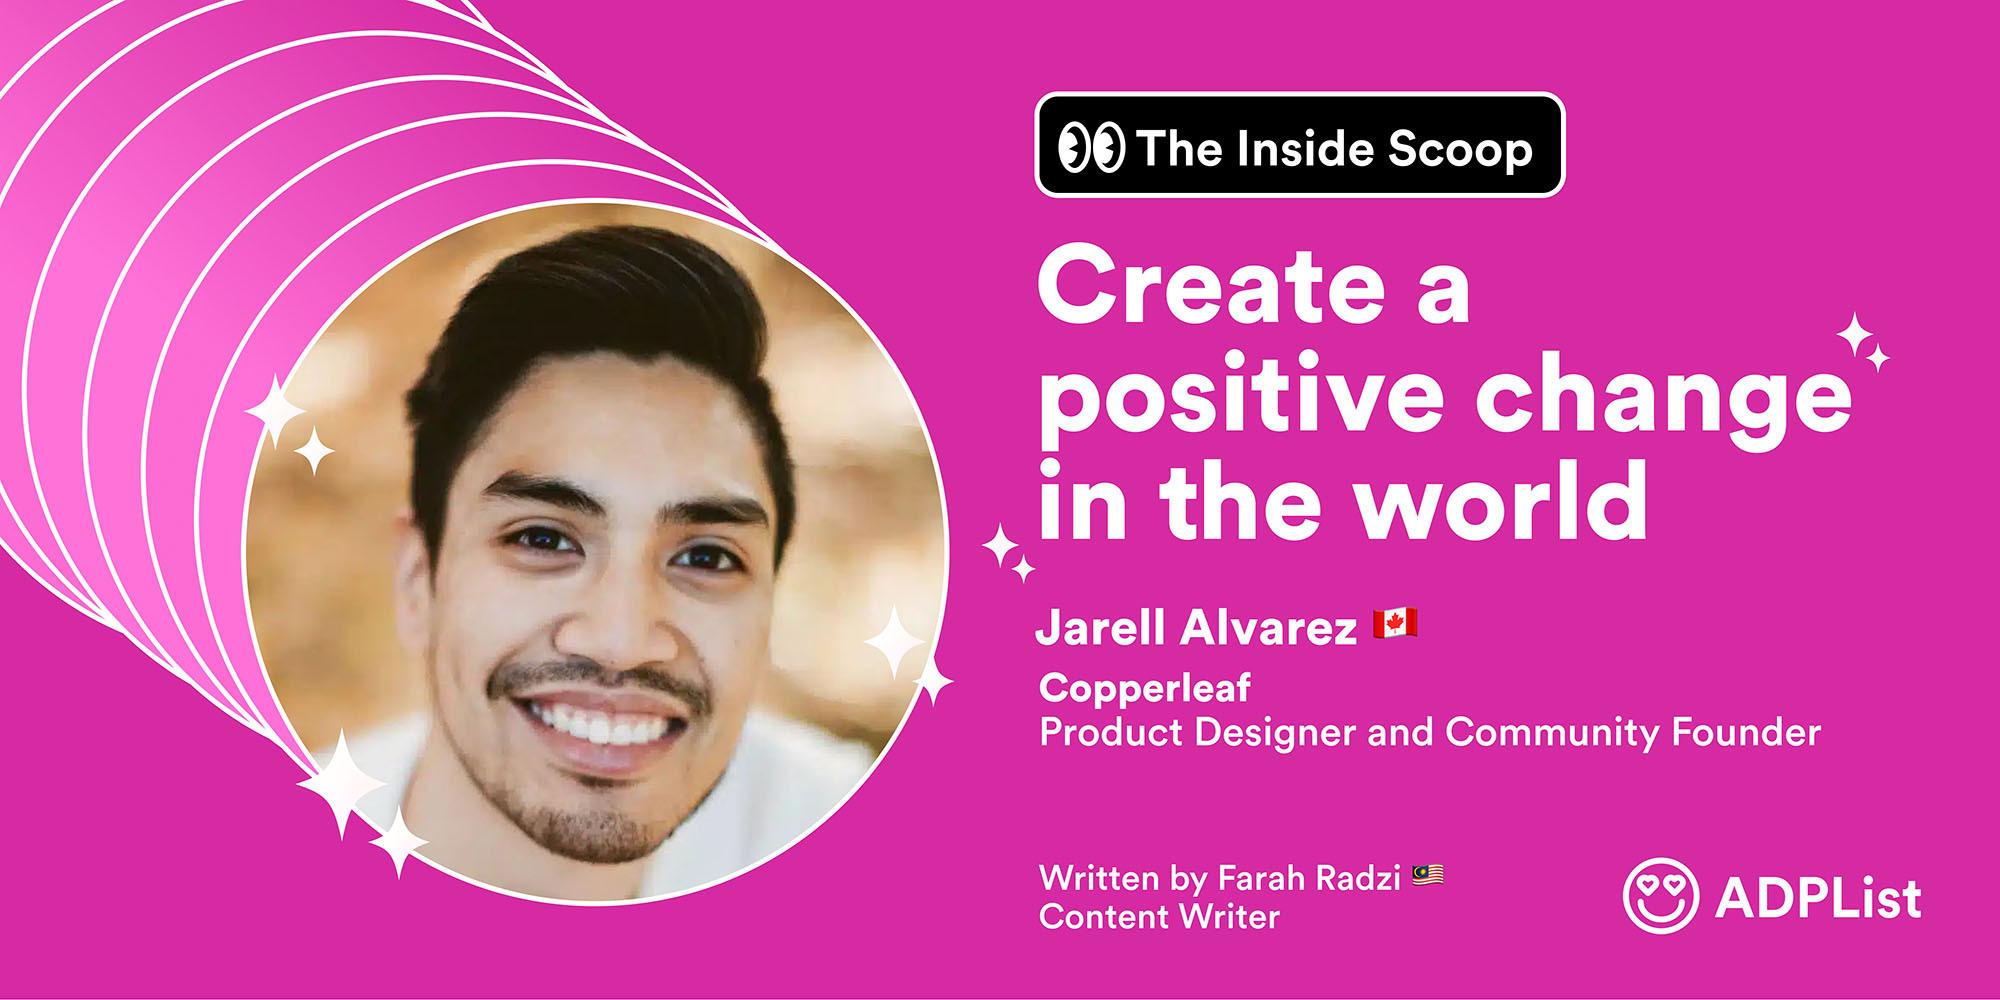 � The Inside Scoop : Jarrel Alvarez 🇨🇦